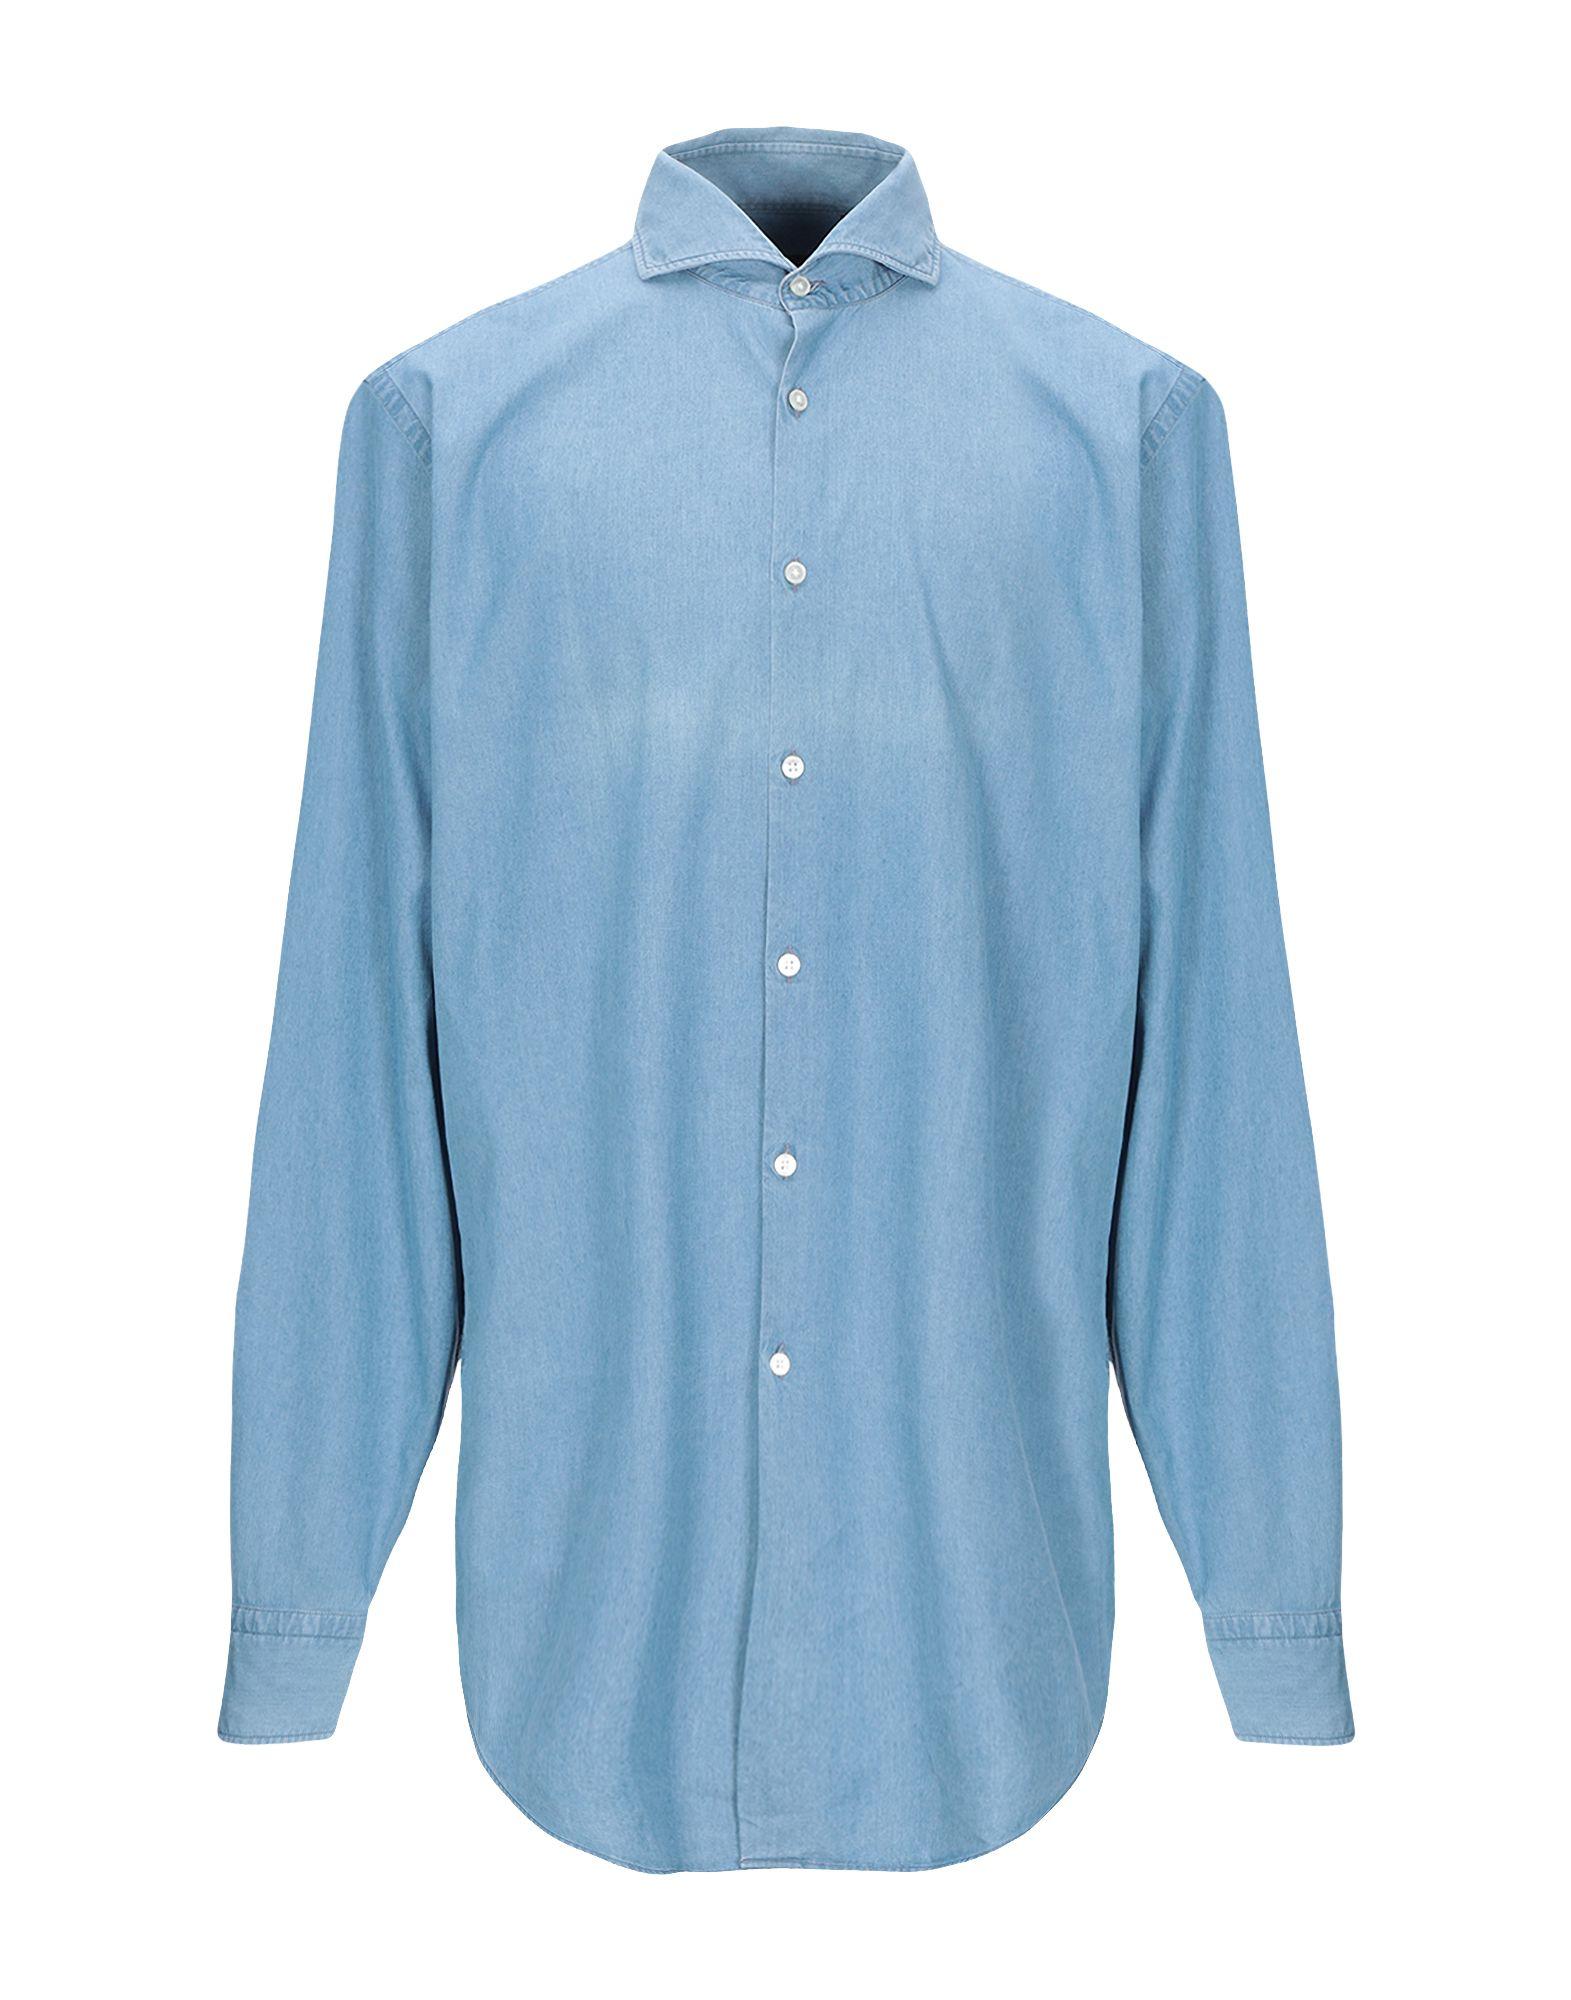 BOSS HUGO BOSS Джинсовая рубашка цена